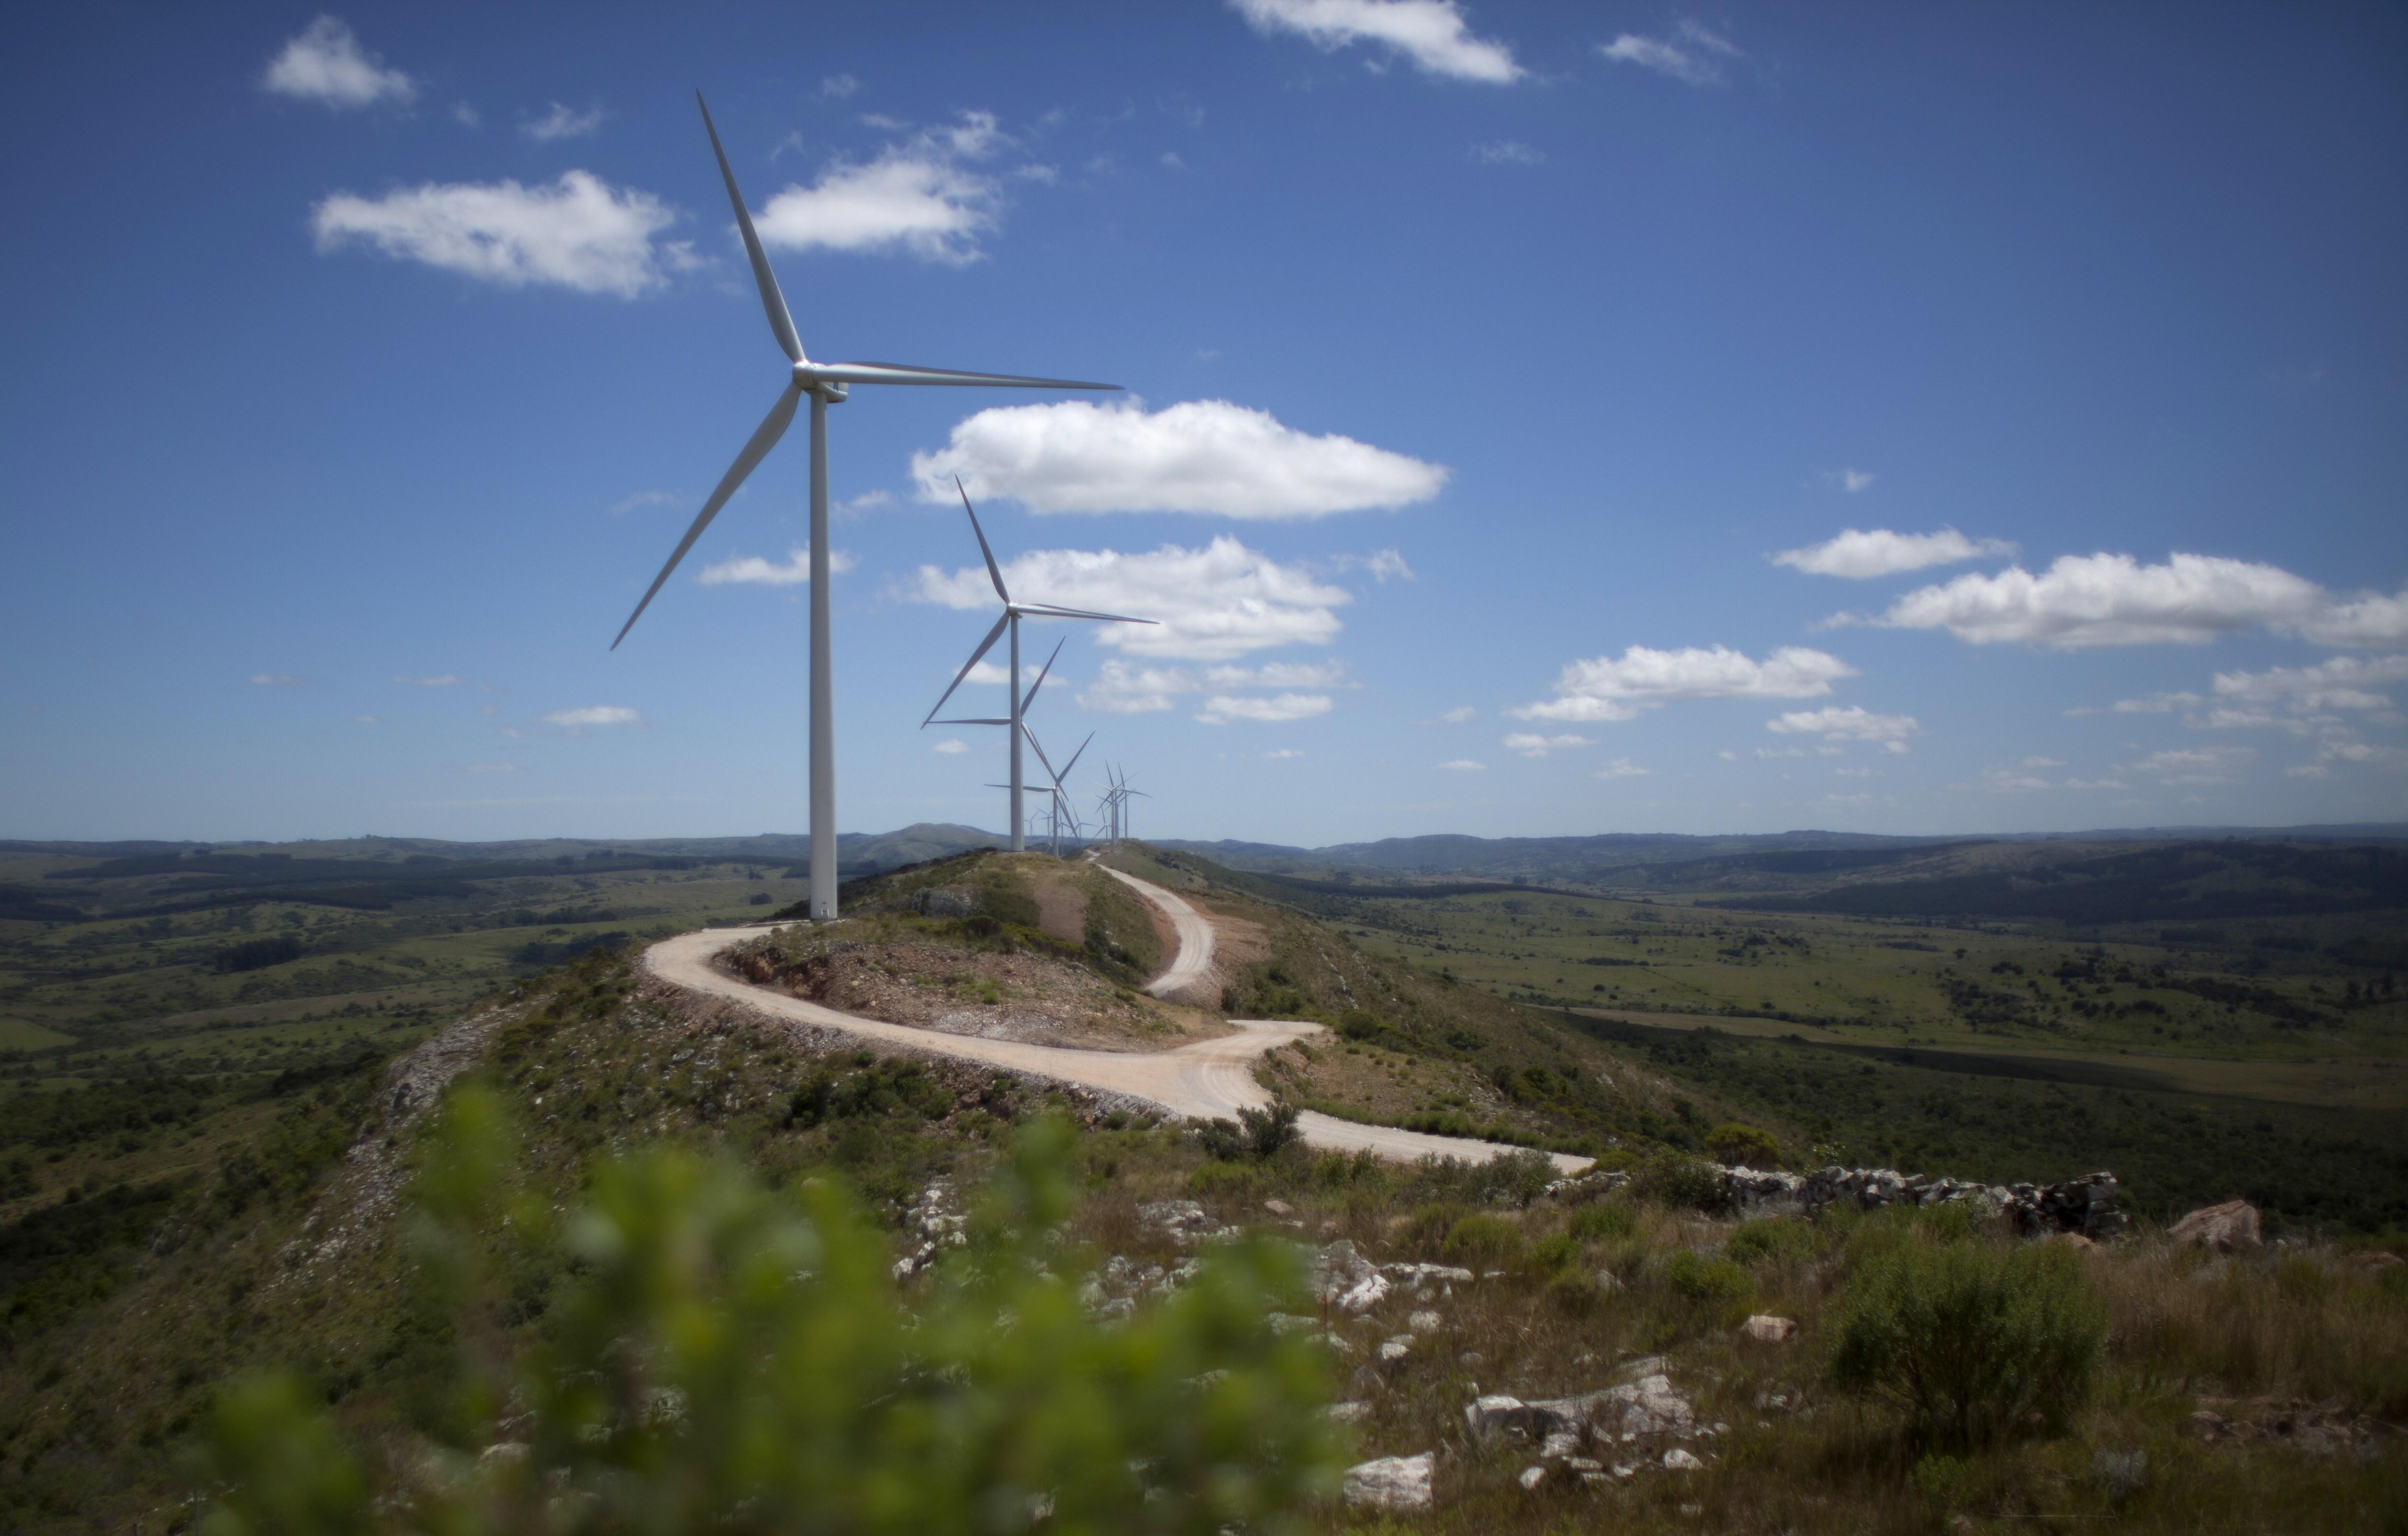 URUGUAY-ENVIRONMENT-ENERGY-WIND